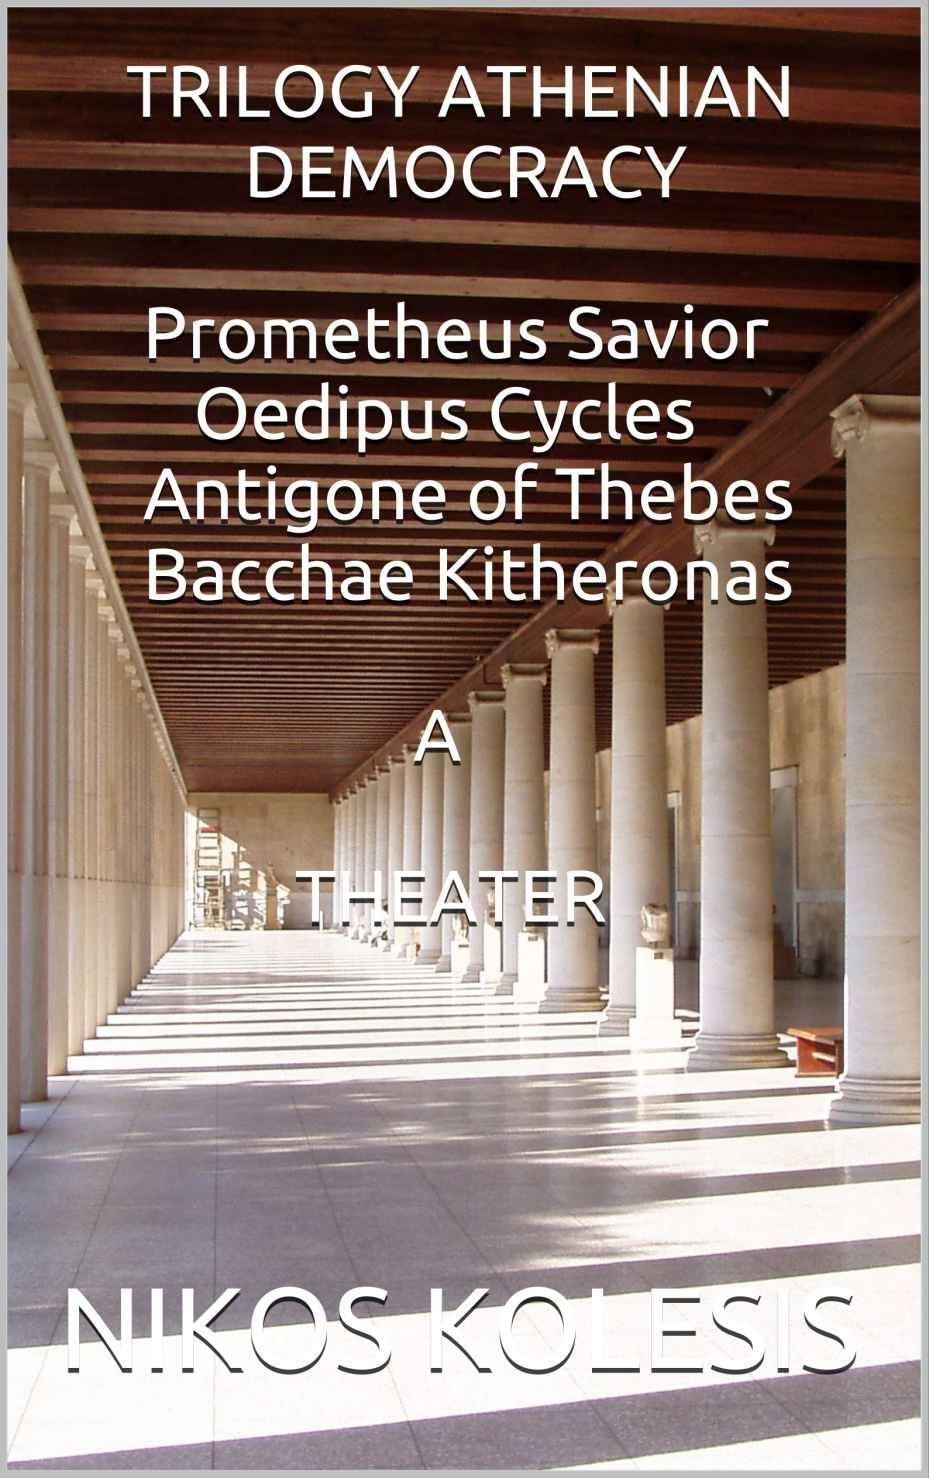 TRILOGY ATHENIAN DEMOCRACY Electras Clytemnestra Jocasta Antigone- Electra B THEATER